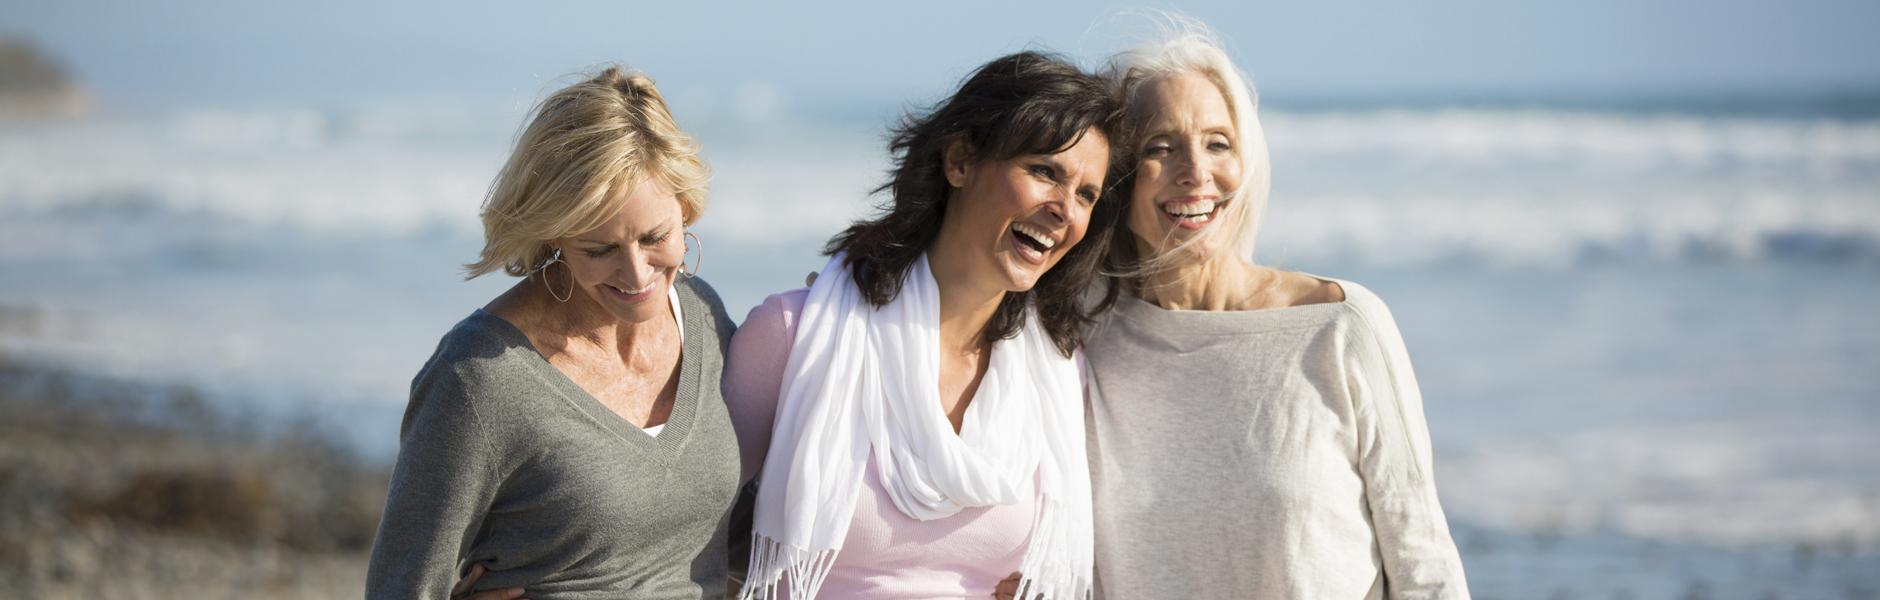 Azo Product Image Women on Beach